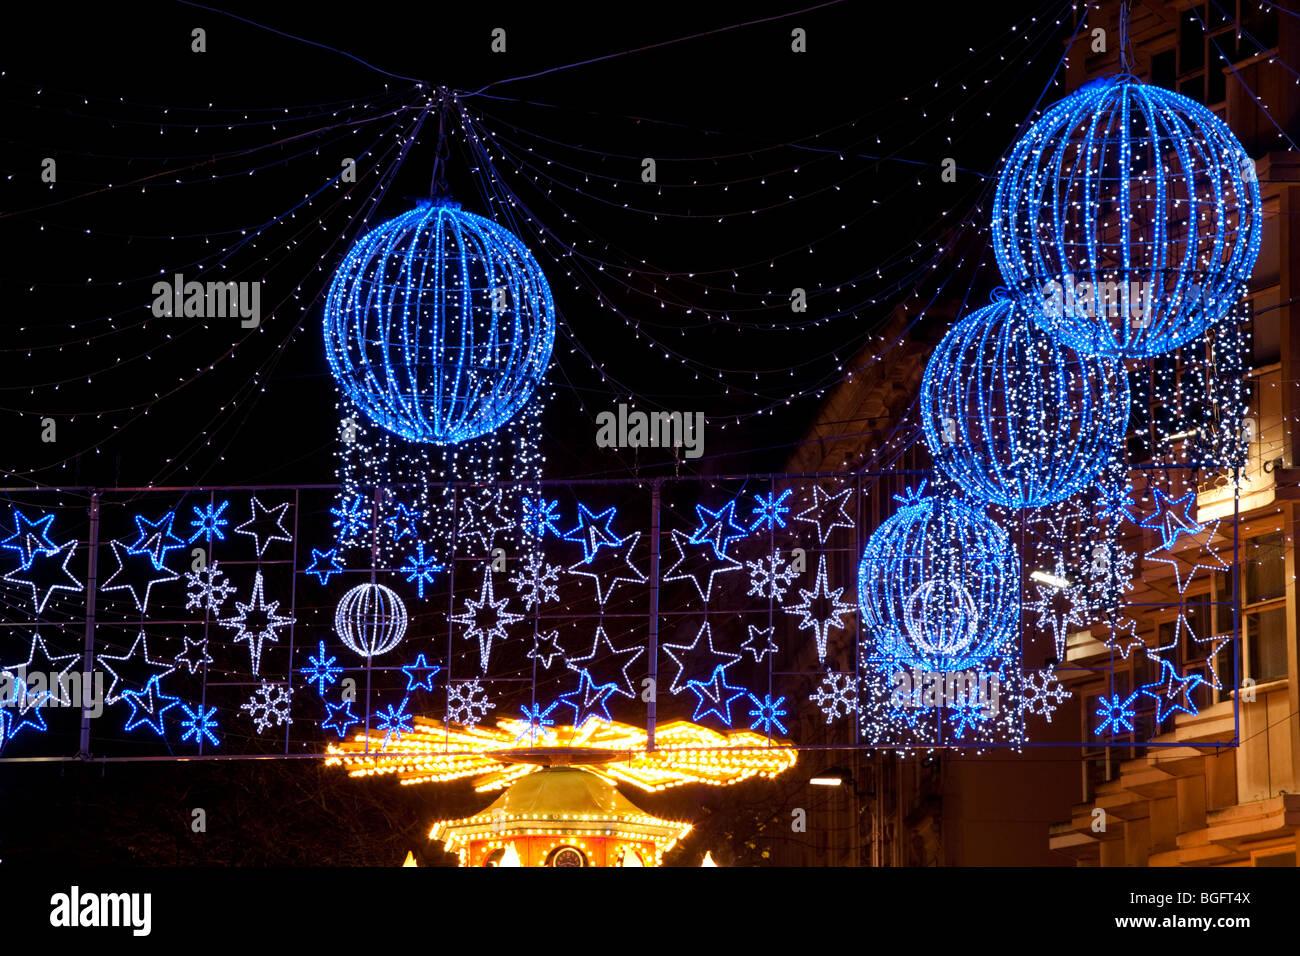 Birmingham Christmas Lights.Christmas Lights Birmingham Stock Photo 27393098 Alamy